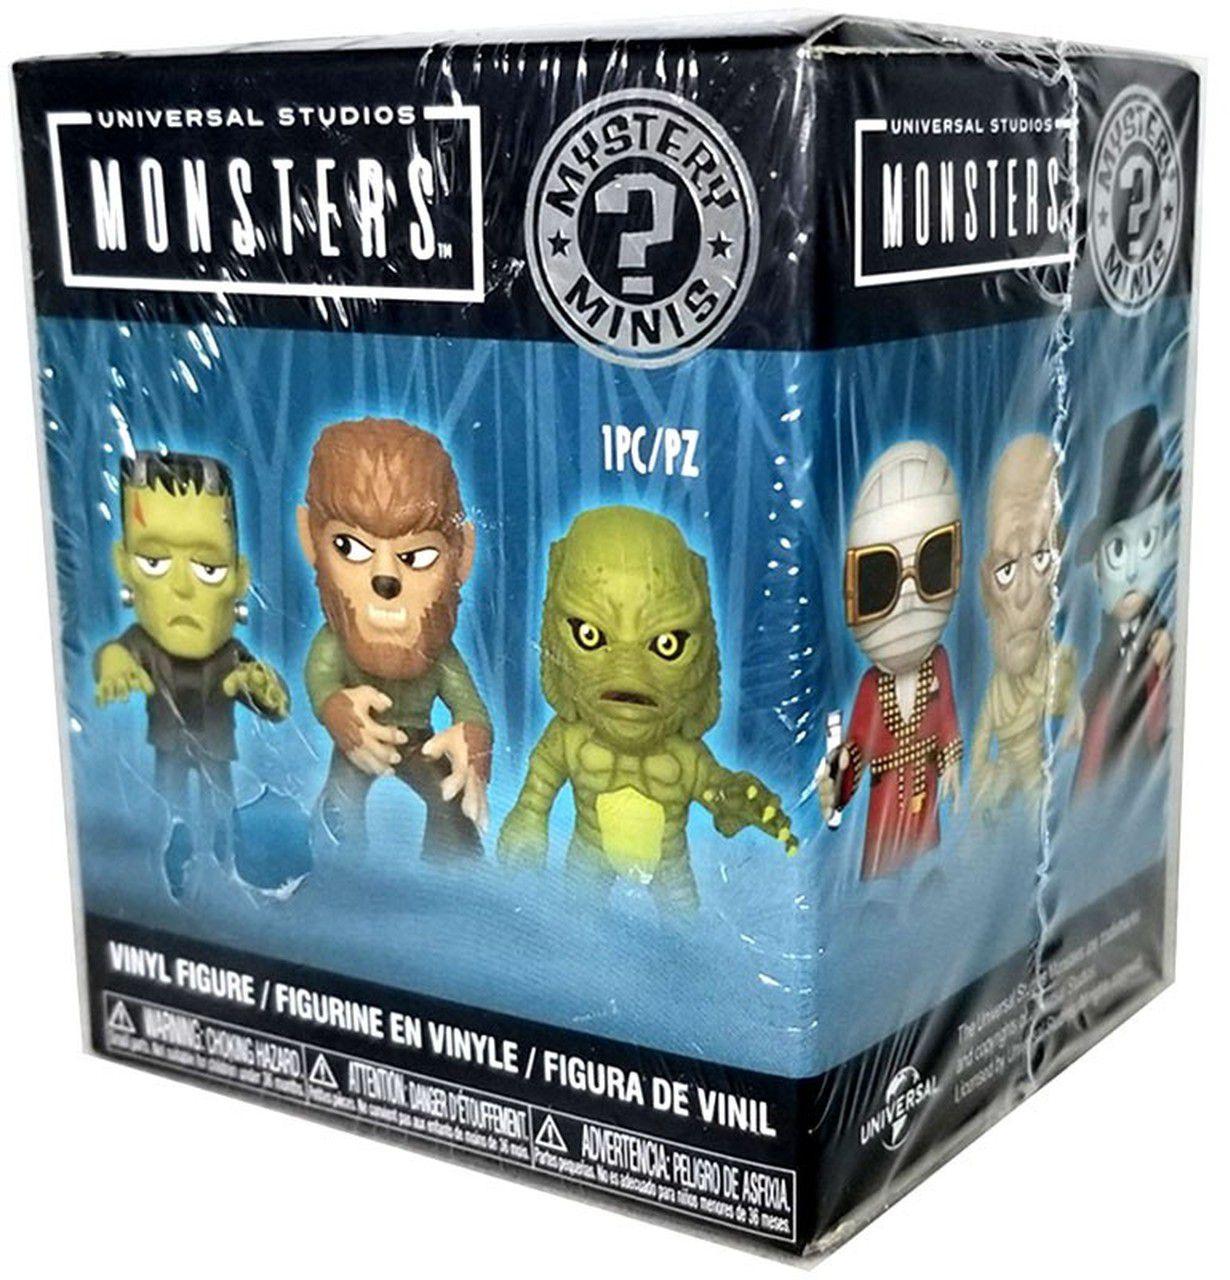 Funko Mystery Minis Universal Monsters - The Mummy